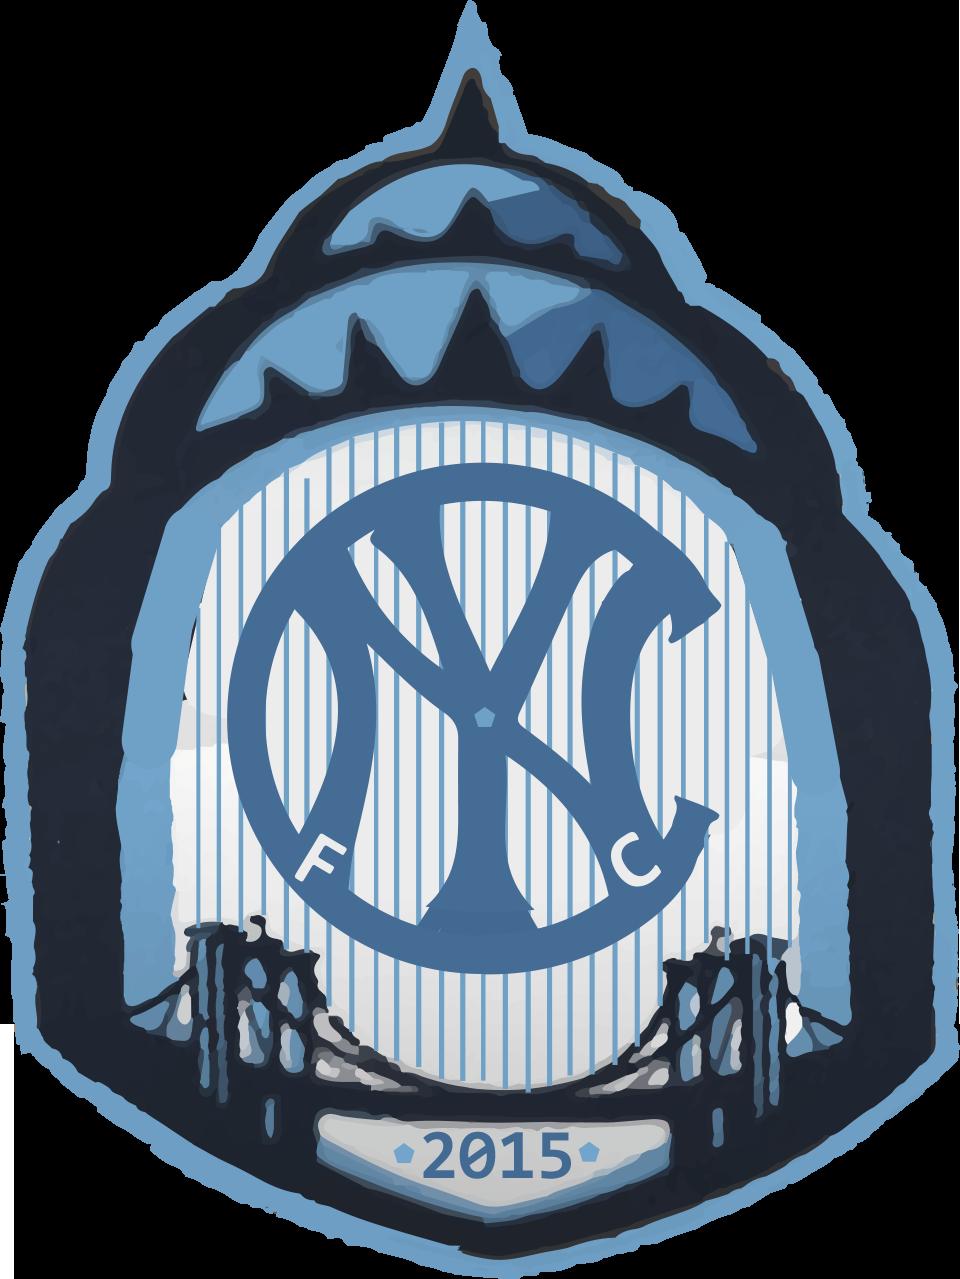 nyc fc crest design idea